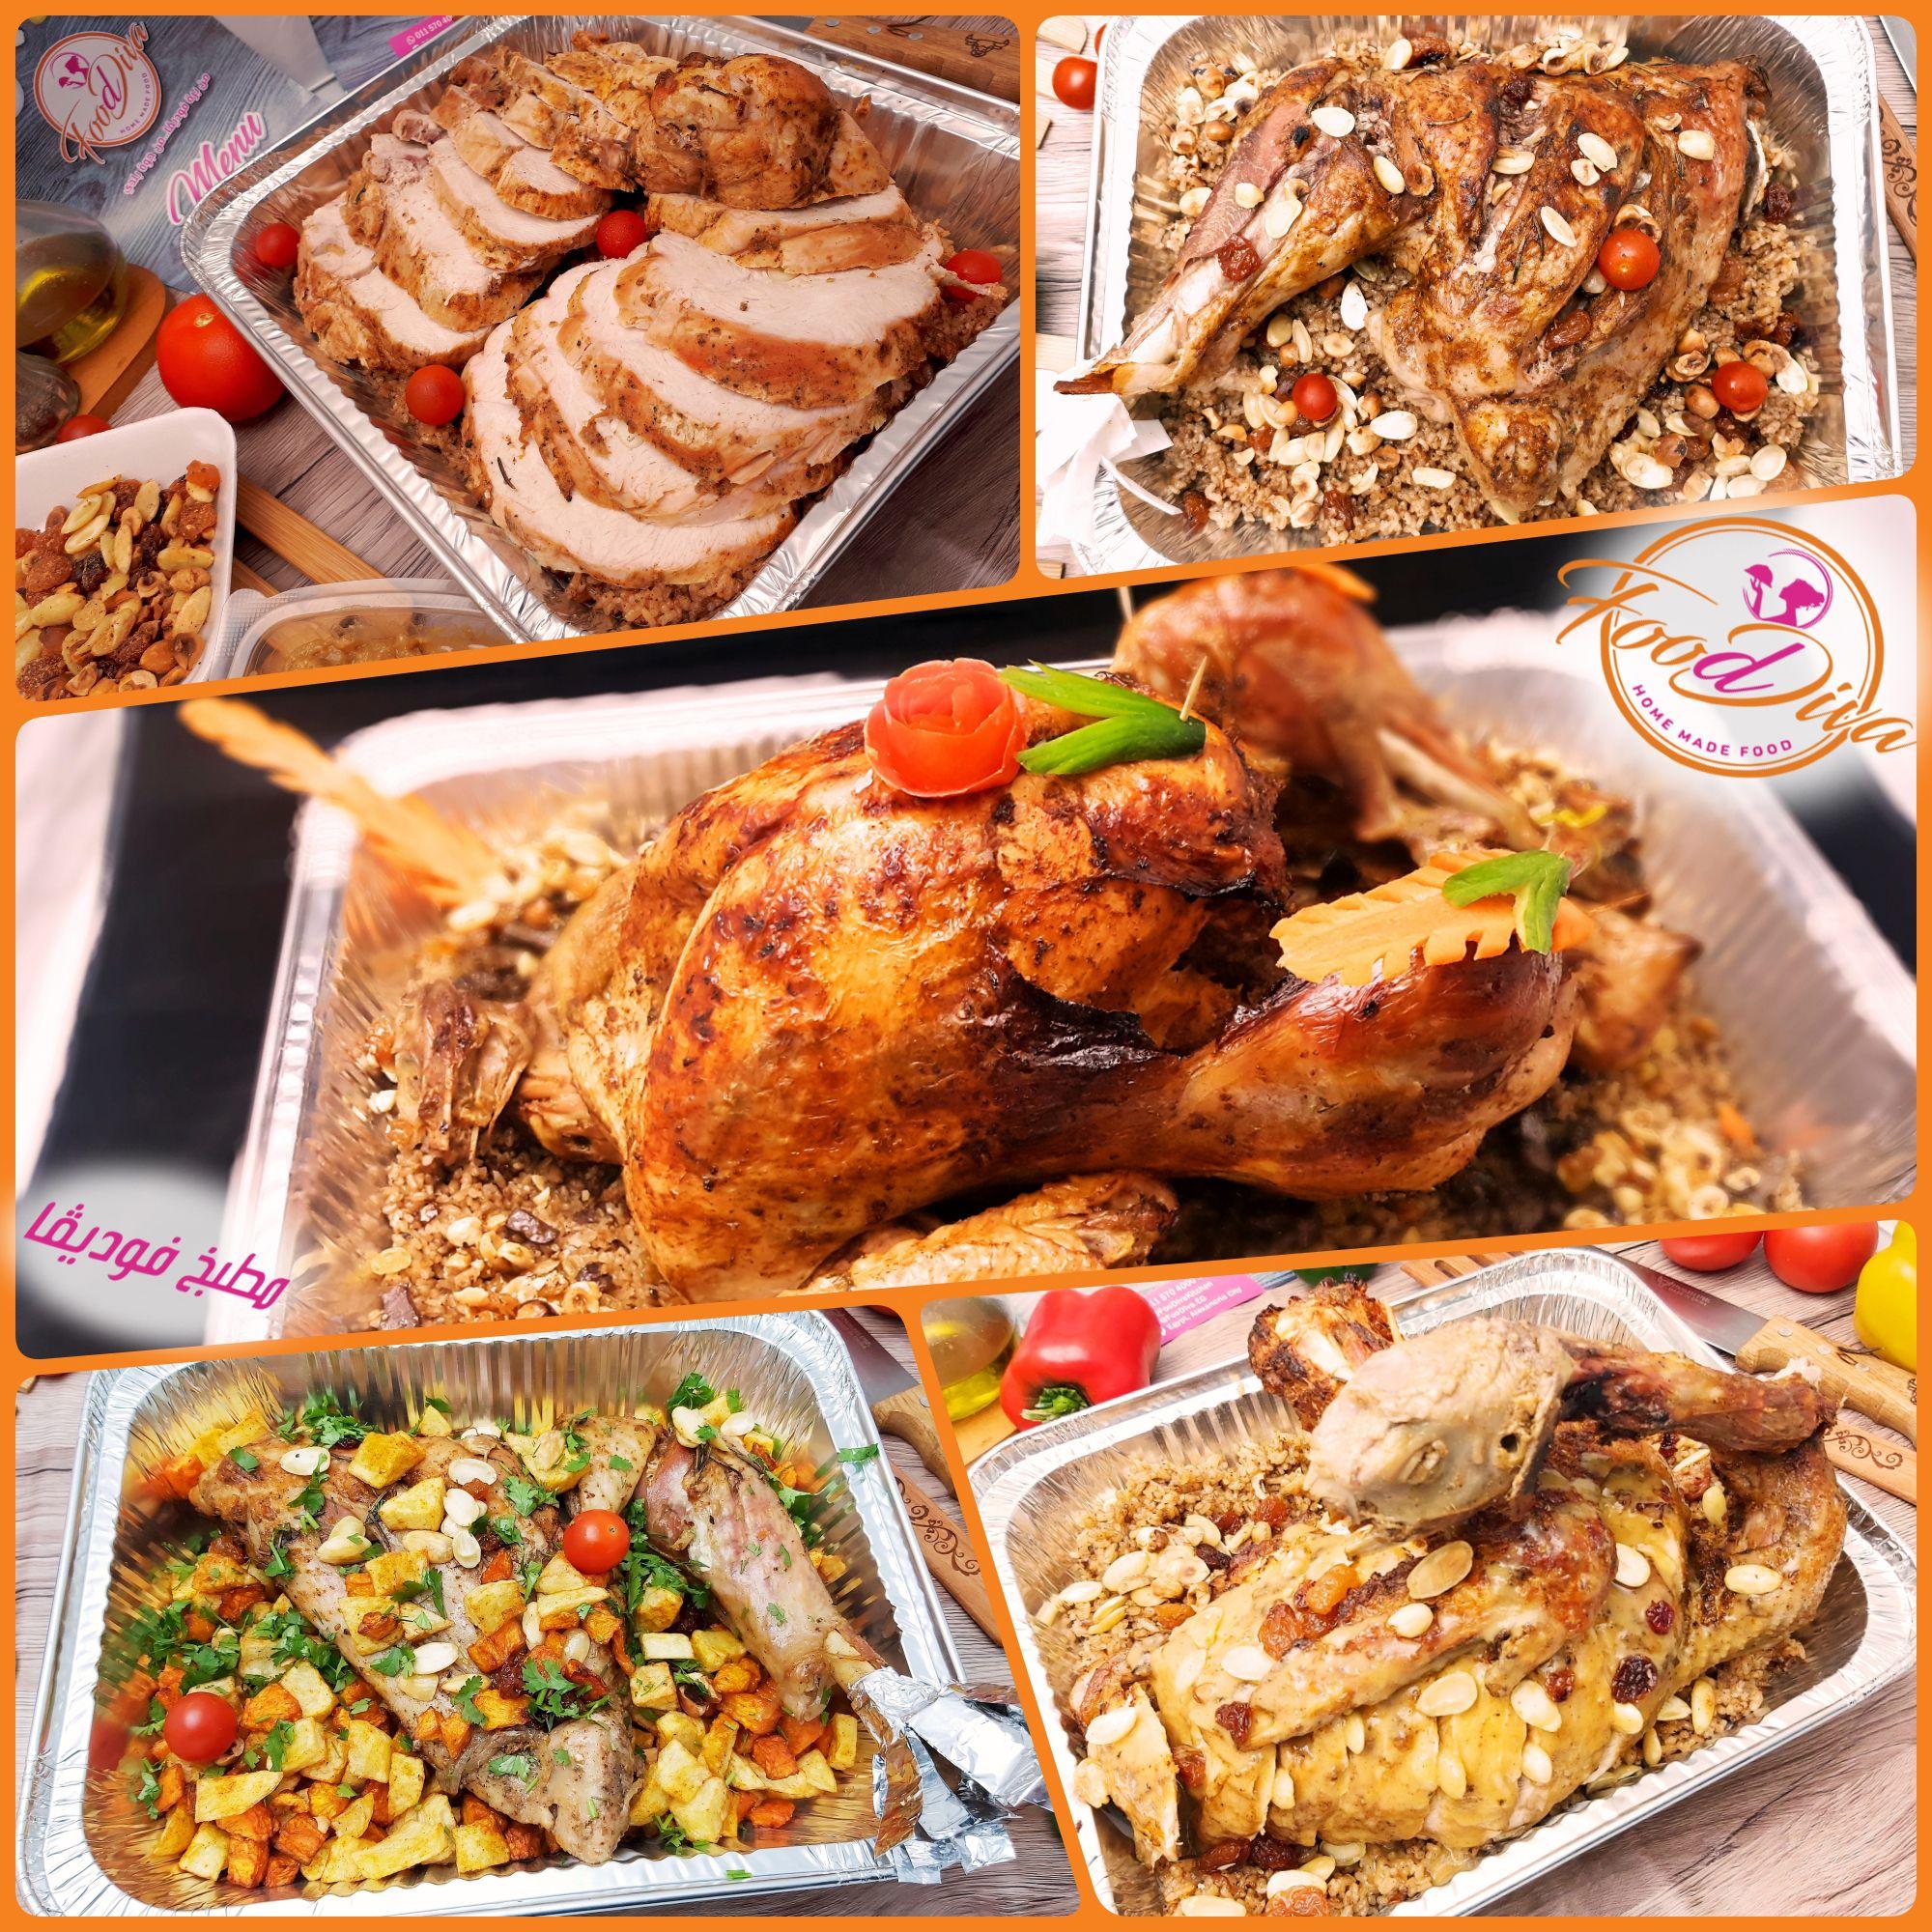 الرومي Chicken Wings Food Menu Items